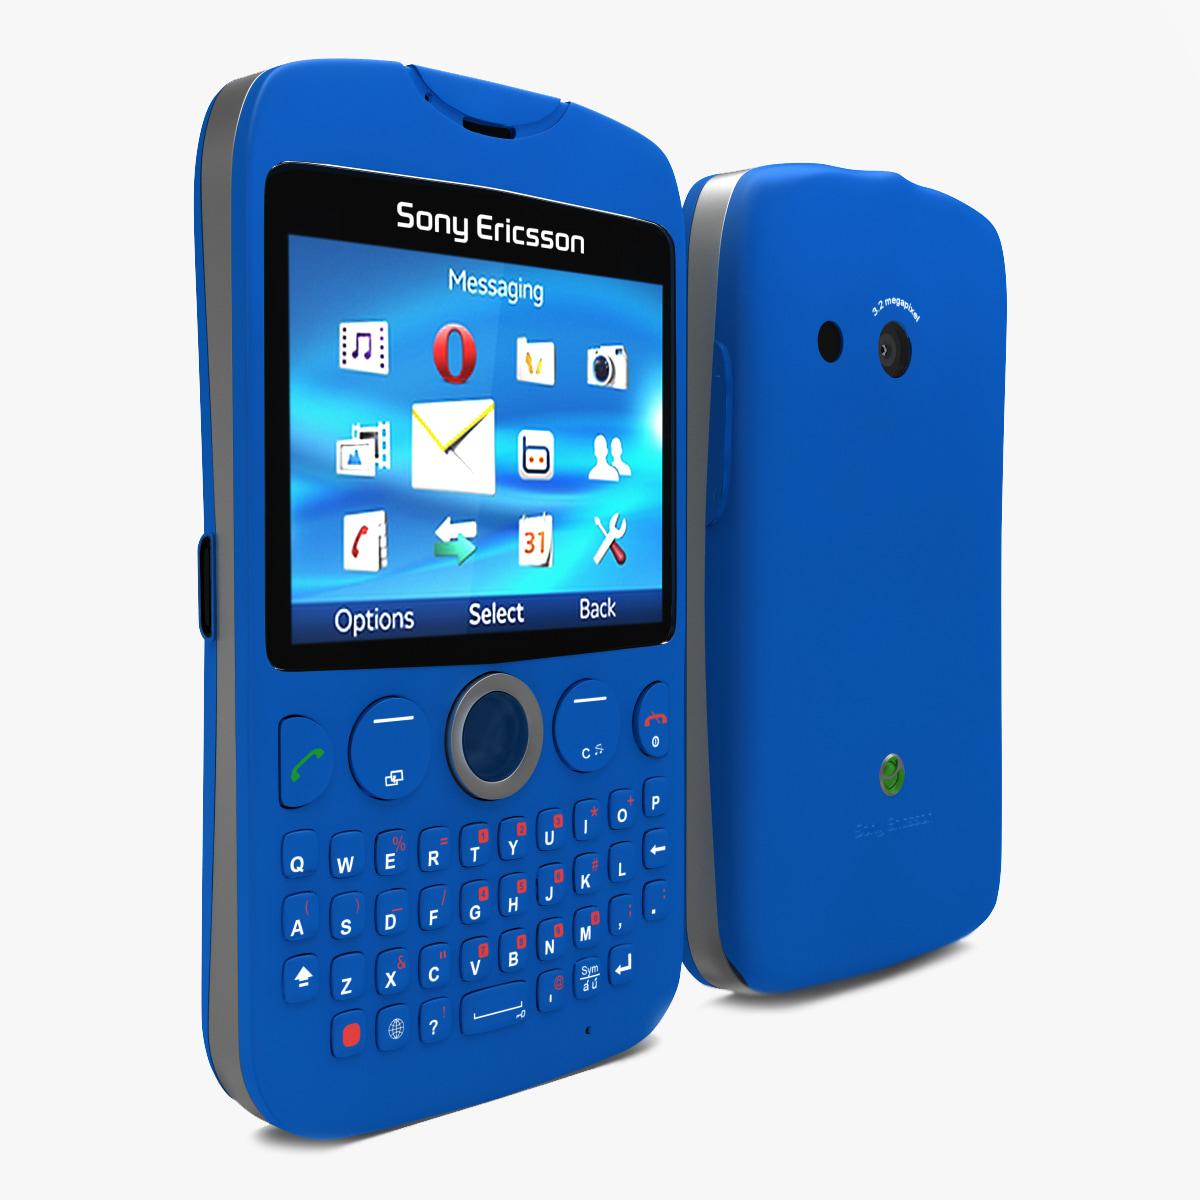 Sony_Ericsson_TXT_CK13i_000.jpg